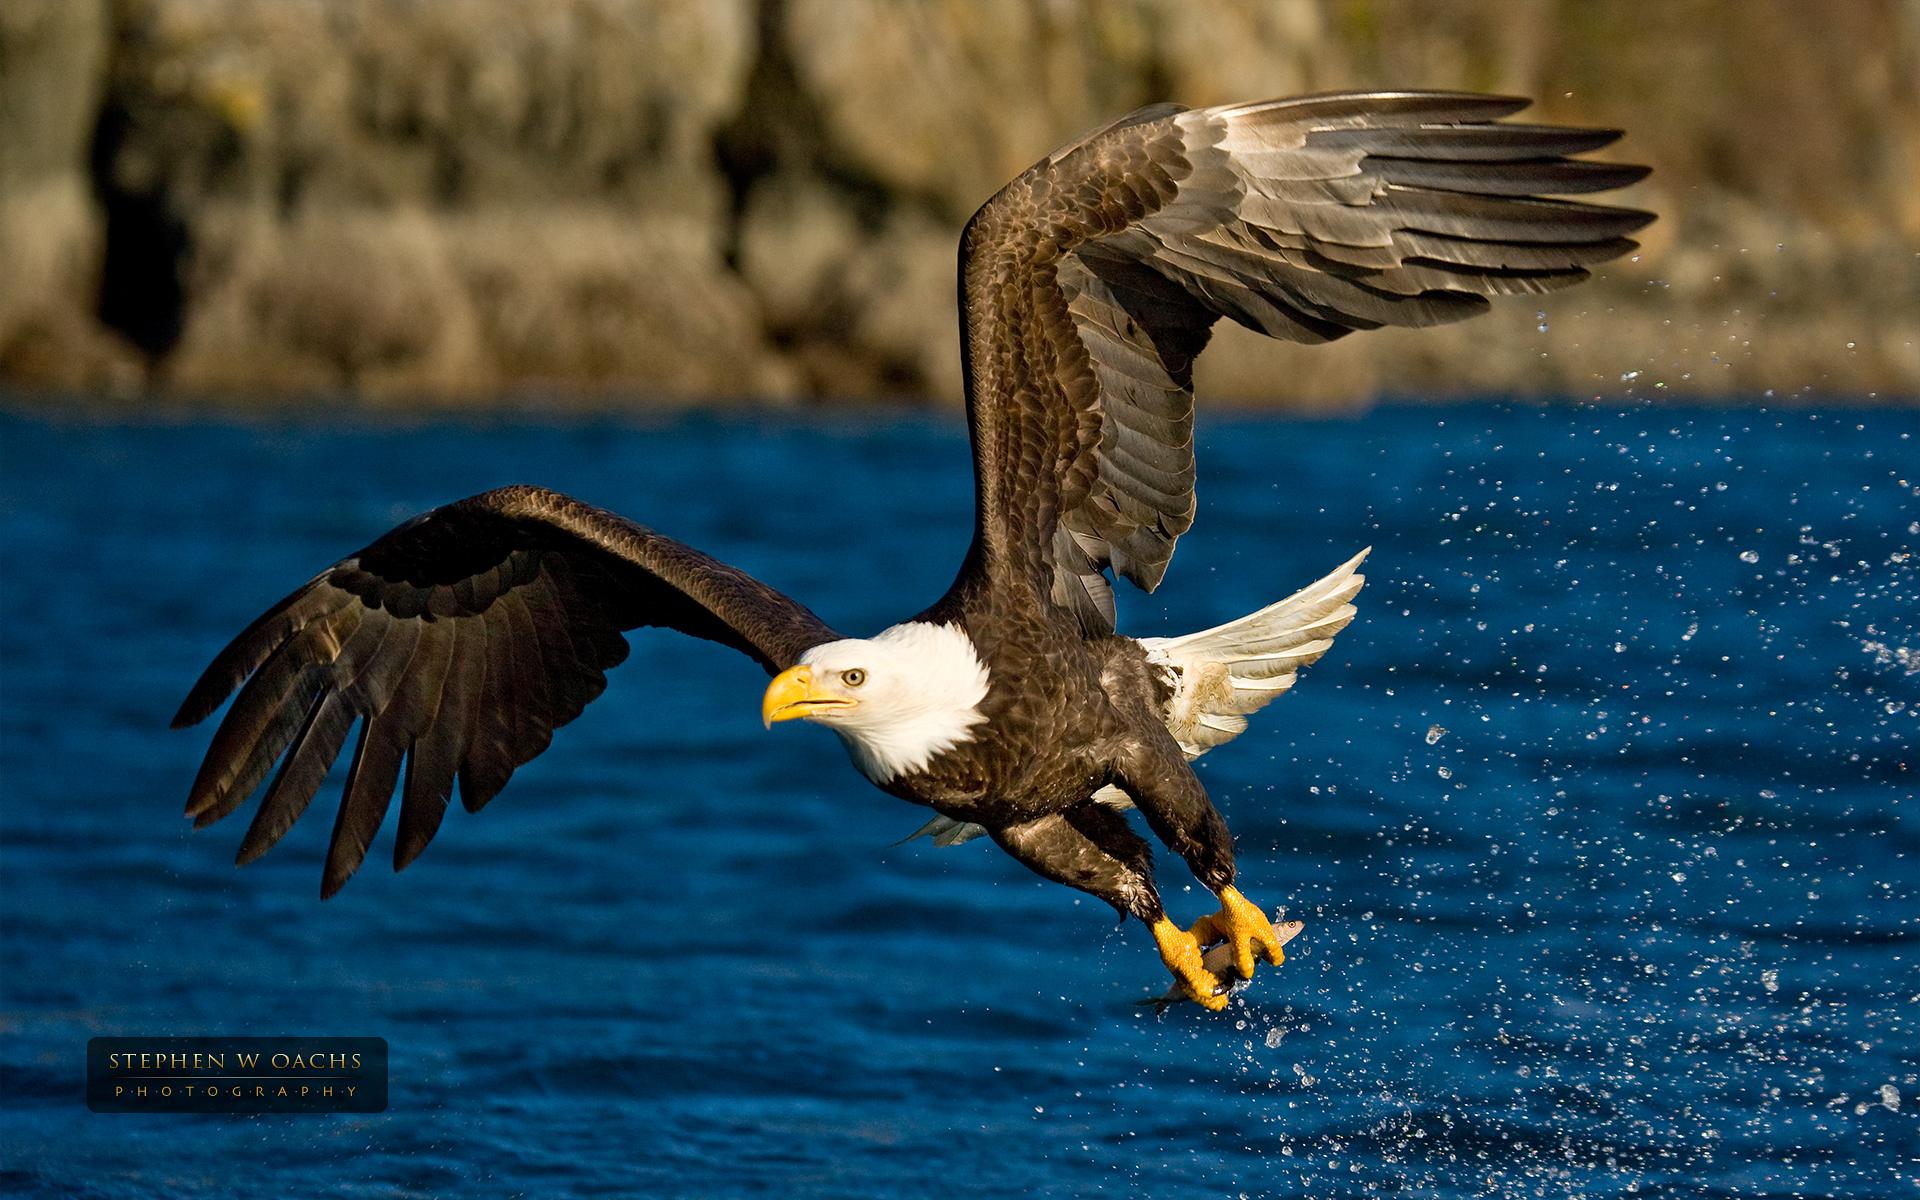 wallpaper fishing eagle beautiful gallery 1920x1200 1920x1200